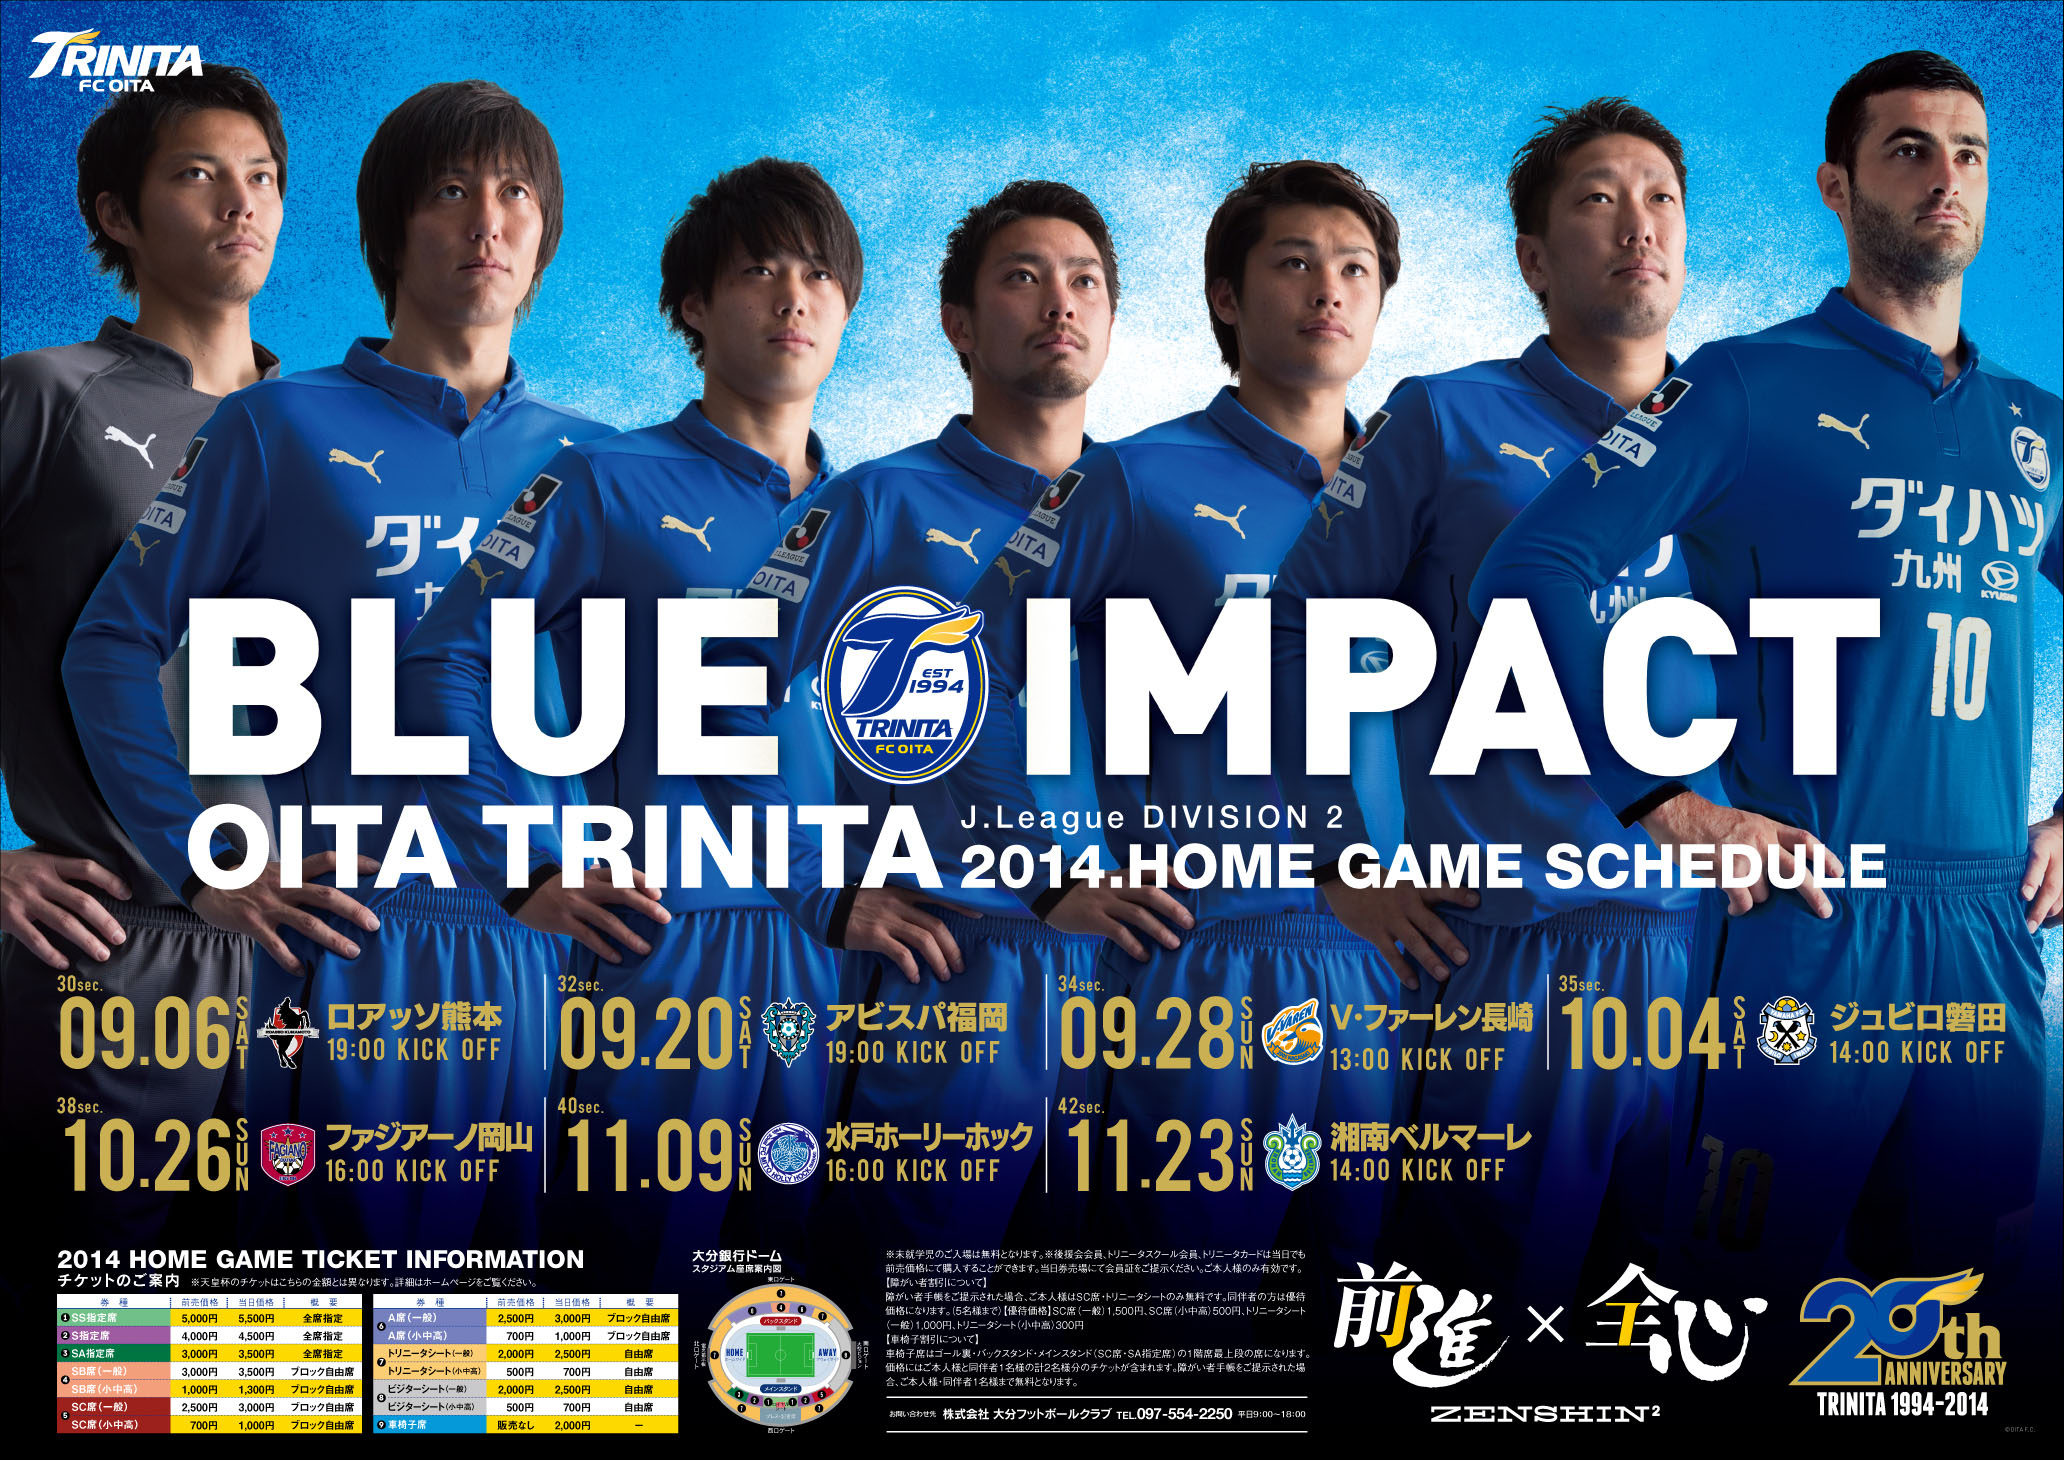 OITA TRINITA 2014後期試合日程ポスター